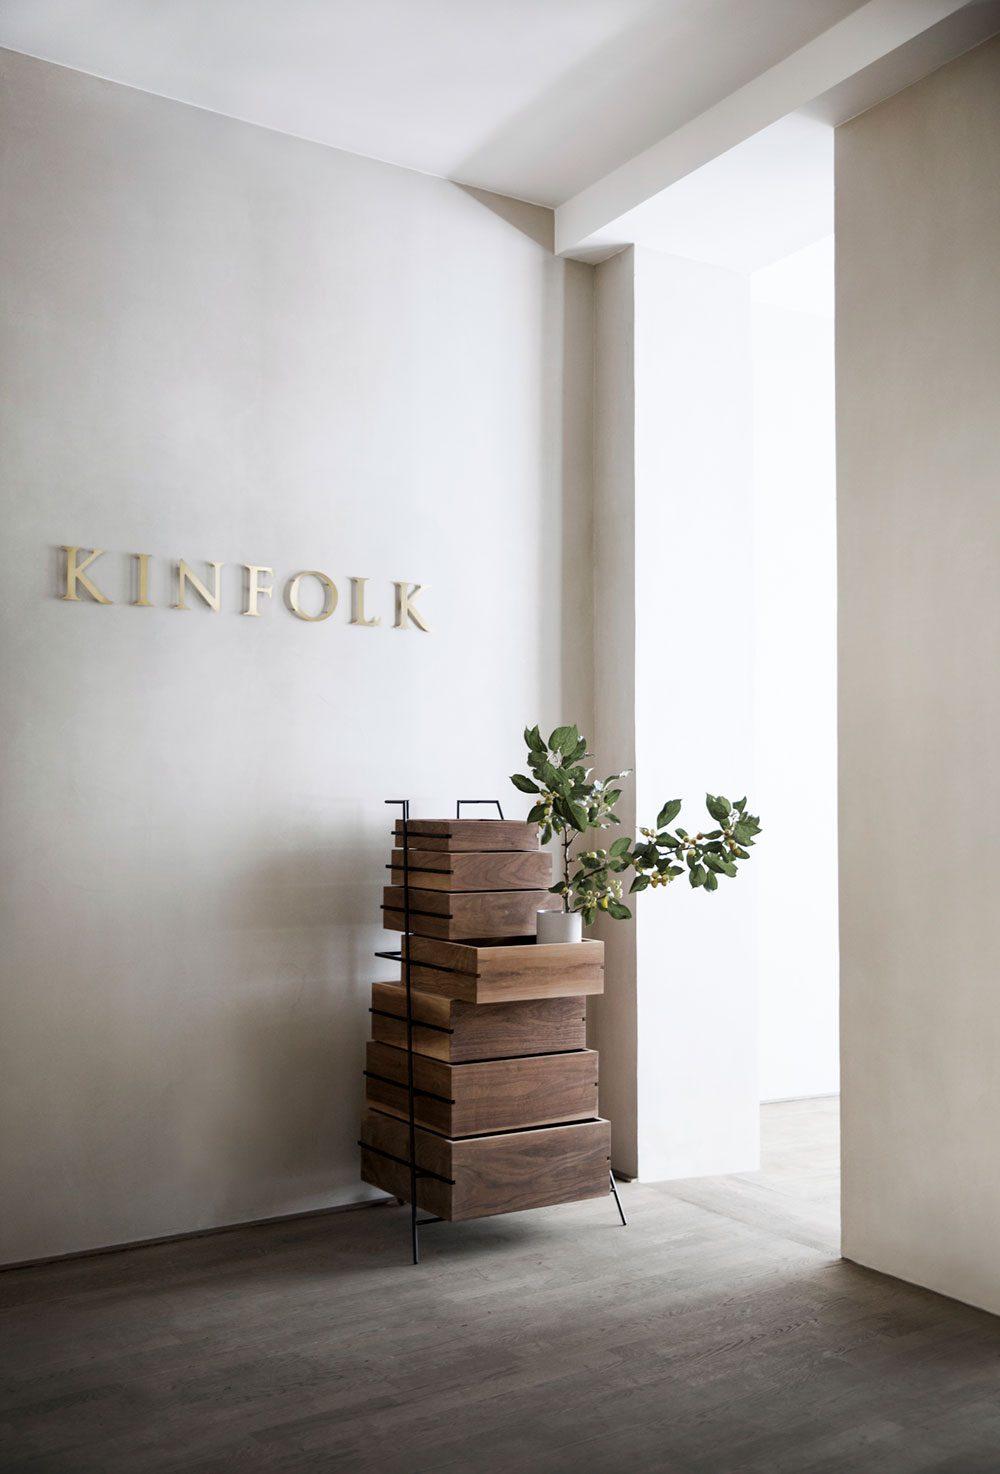 gallery office interiors kinfolk 1000x1474 - Kinfolk Gallery